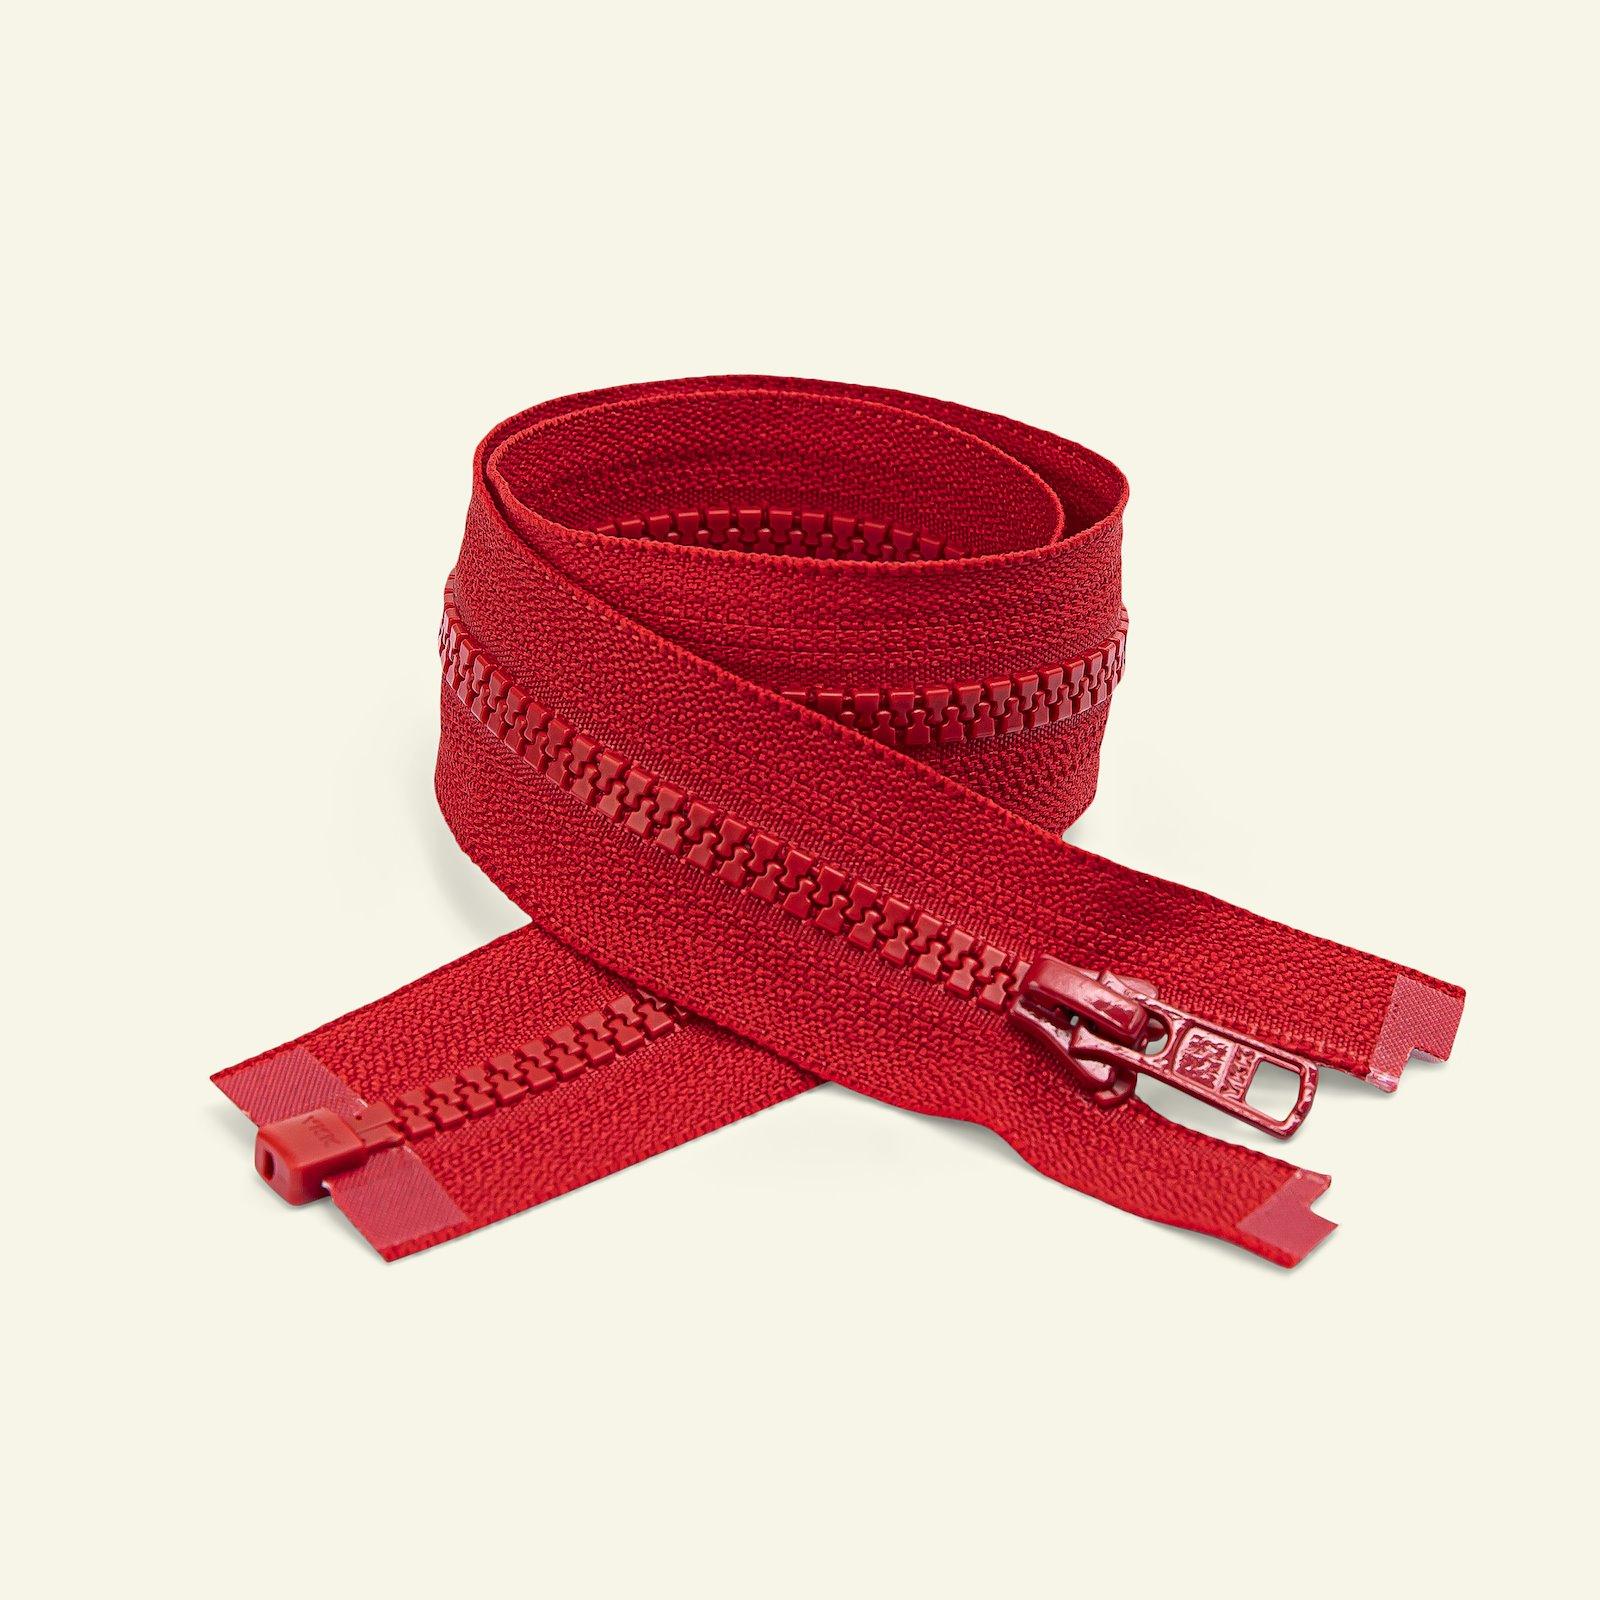 YKK zip 6mm open end 65cm red x50011_pack